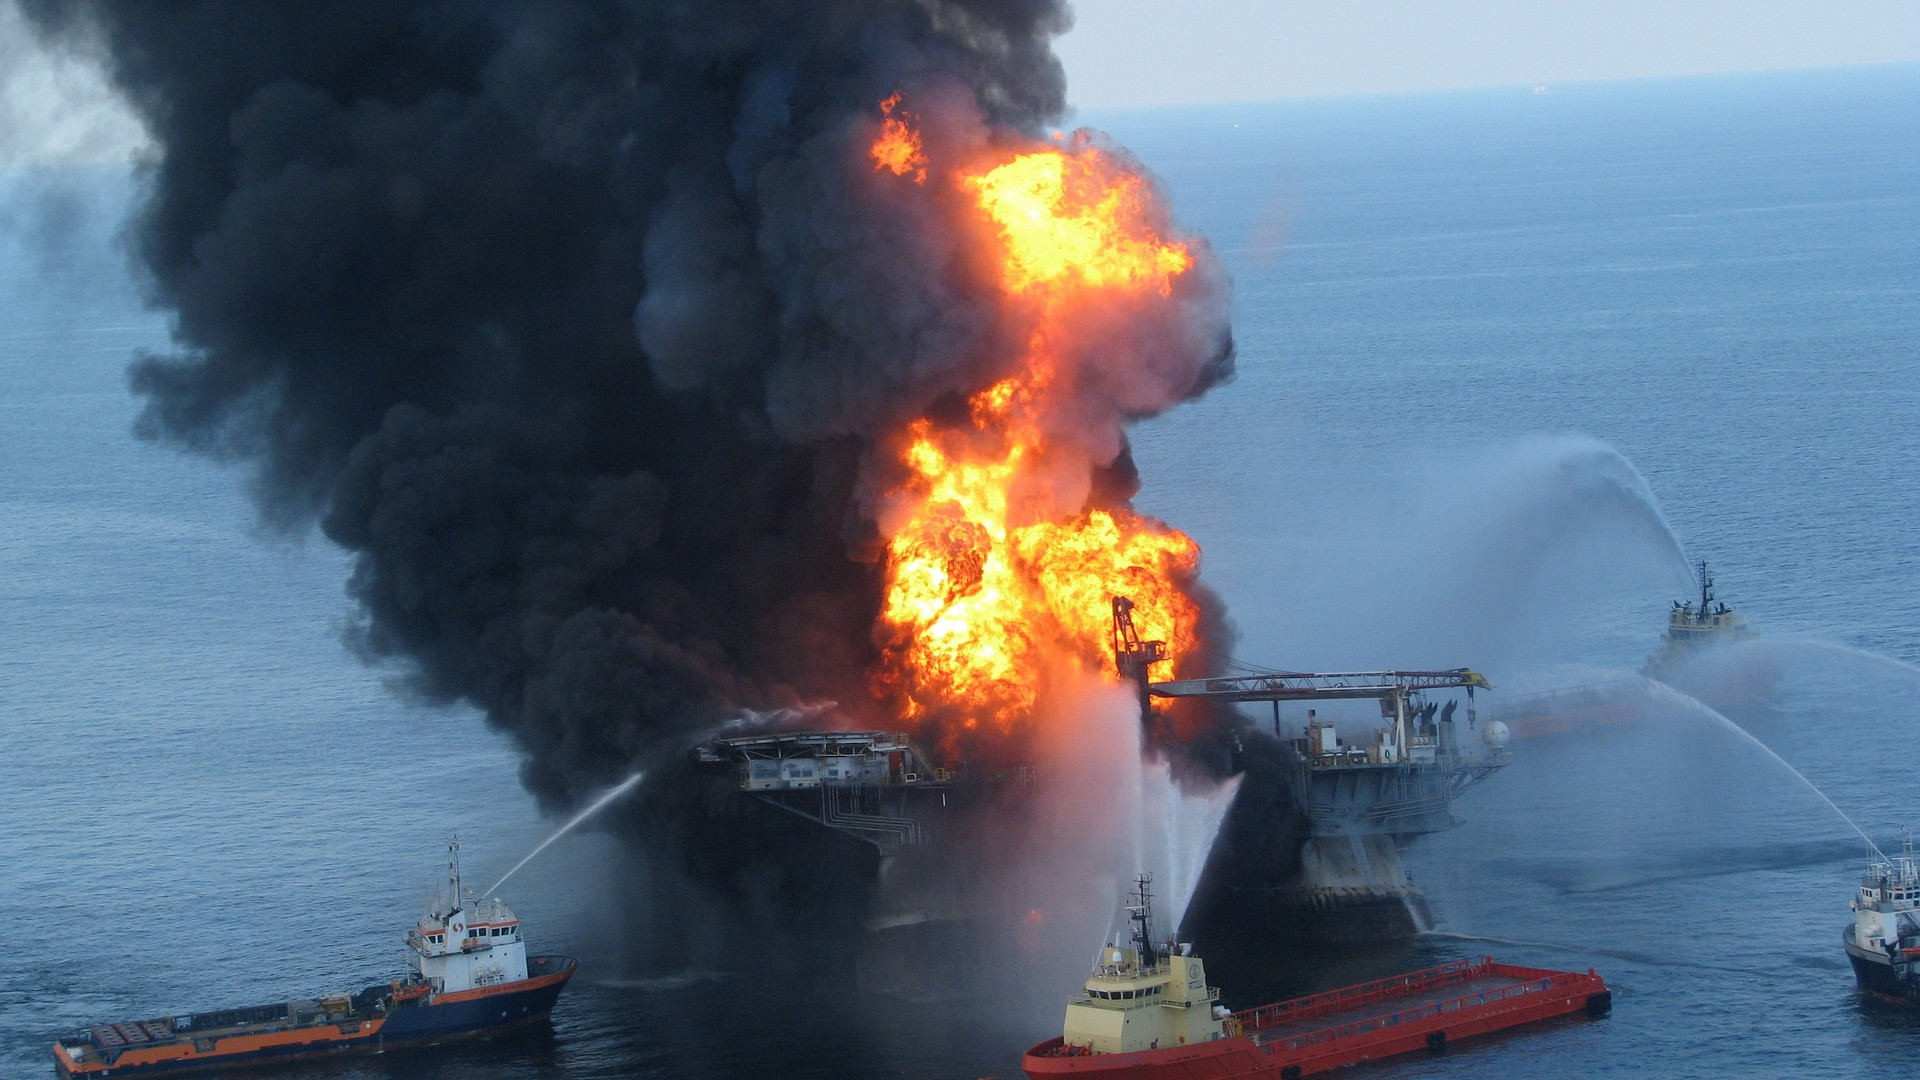 La plateforme de Deepwater Horizon en feu, en avril 2010